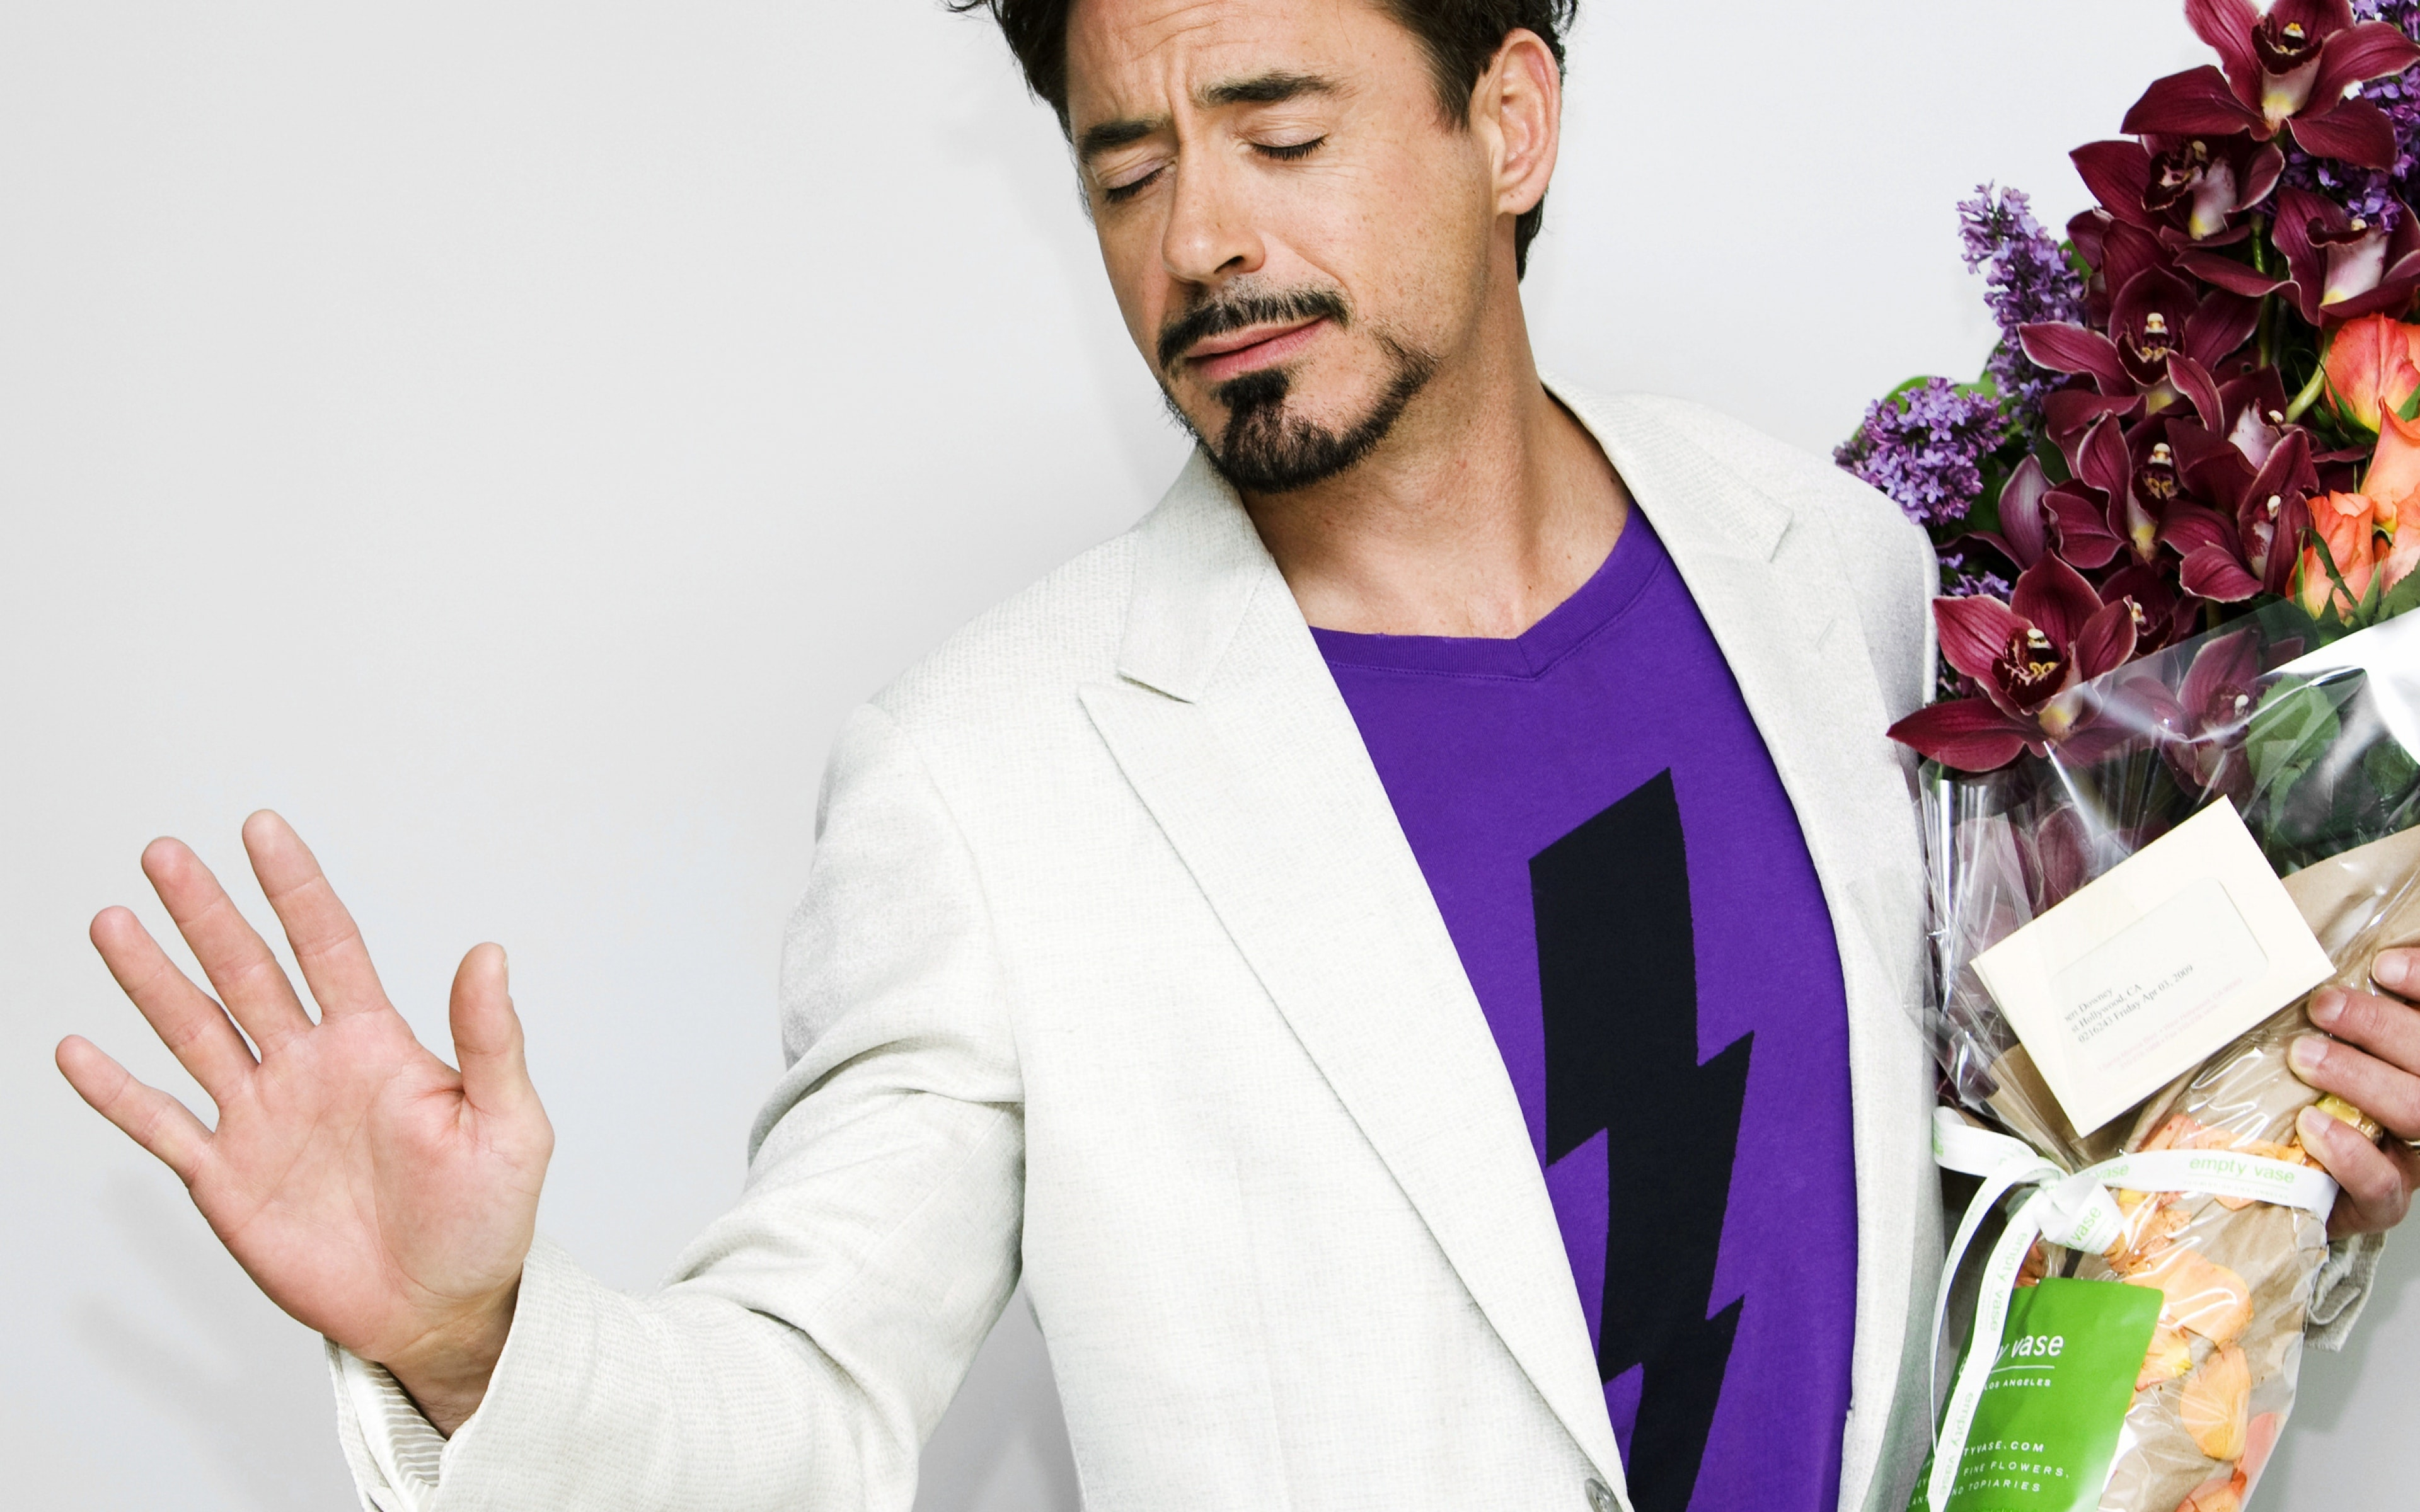 Robert Downey, Jr. HD